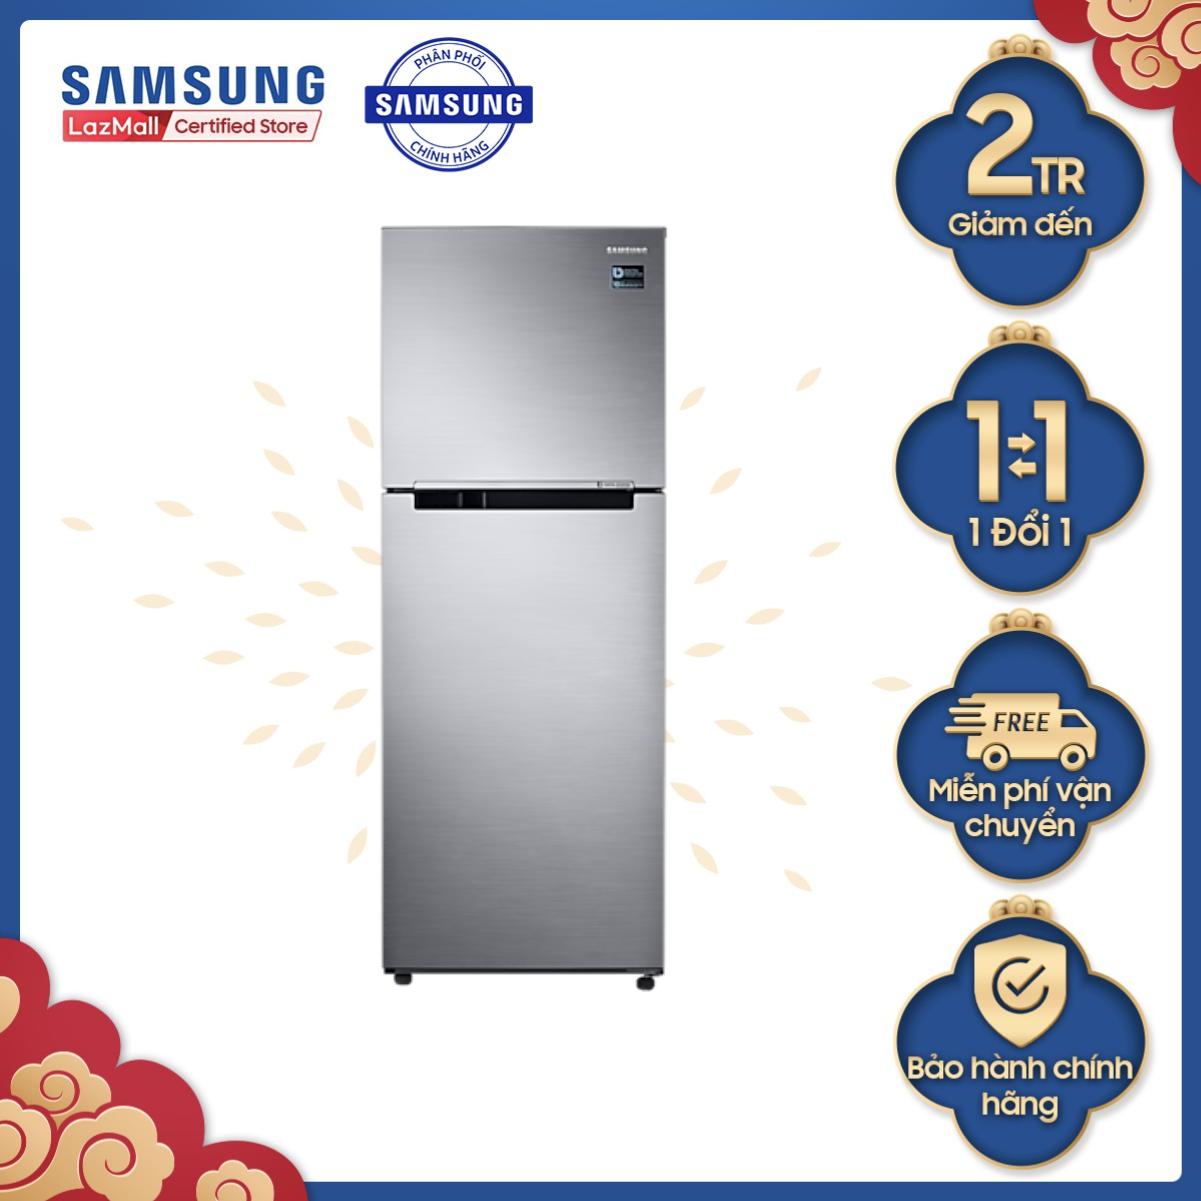 Tủ lạnh Samsung hai cửa Twin Cooling Plus 308L (RT29K5012S8)